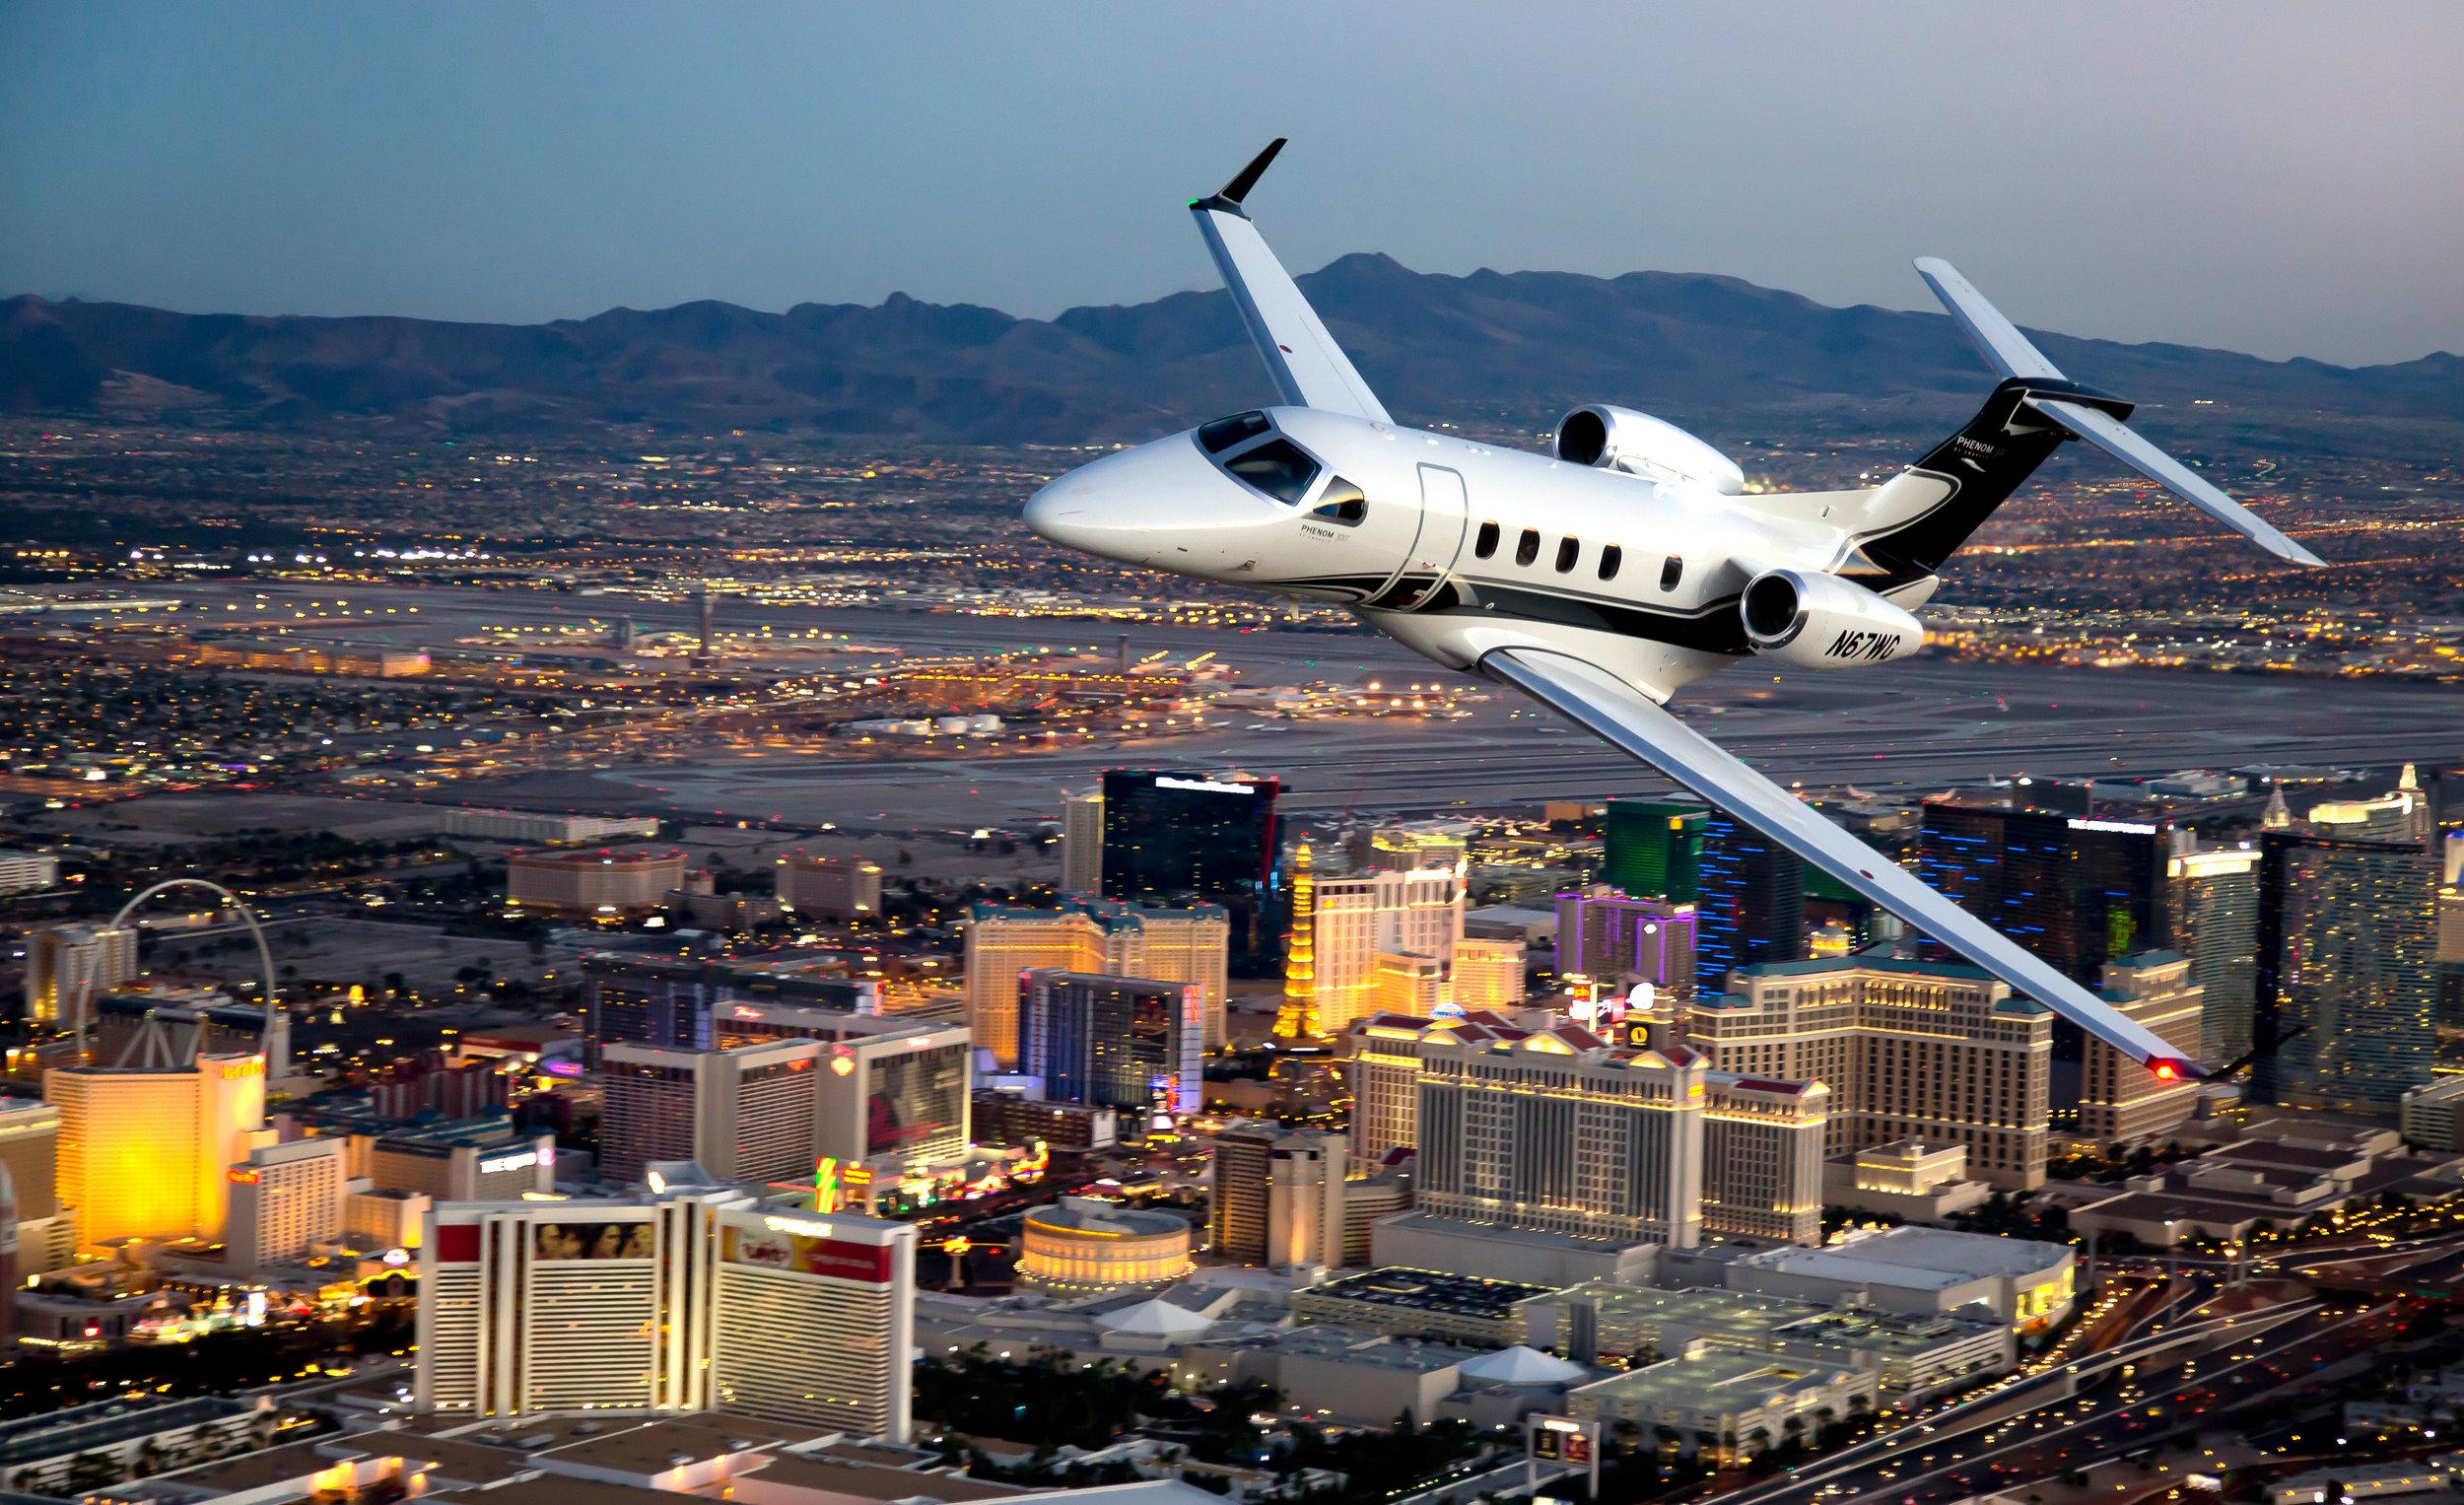 Phenom-300_Light-Jet_Exterior-Flight_Legacy_Aviation_Private_Jet_NetJets_Jet_Charter_TEB_VNY_MIA_PBI_FRG_SFO_FLL_FXE_BED.jpg